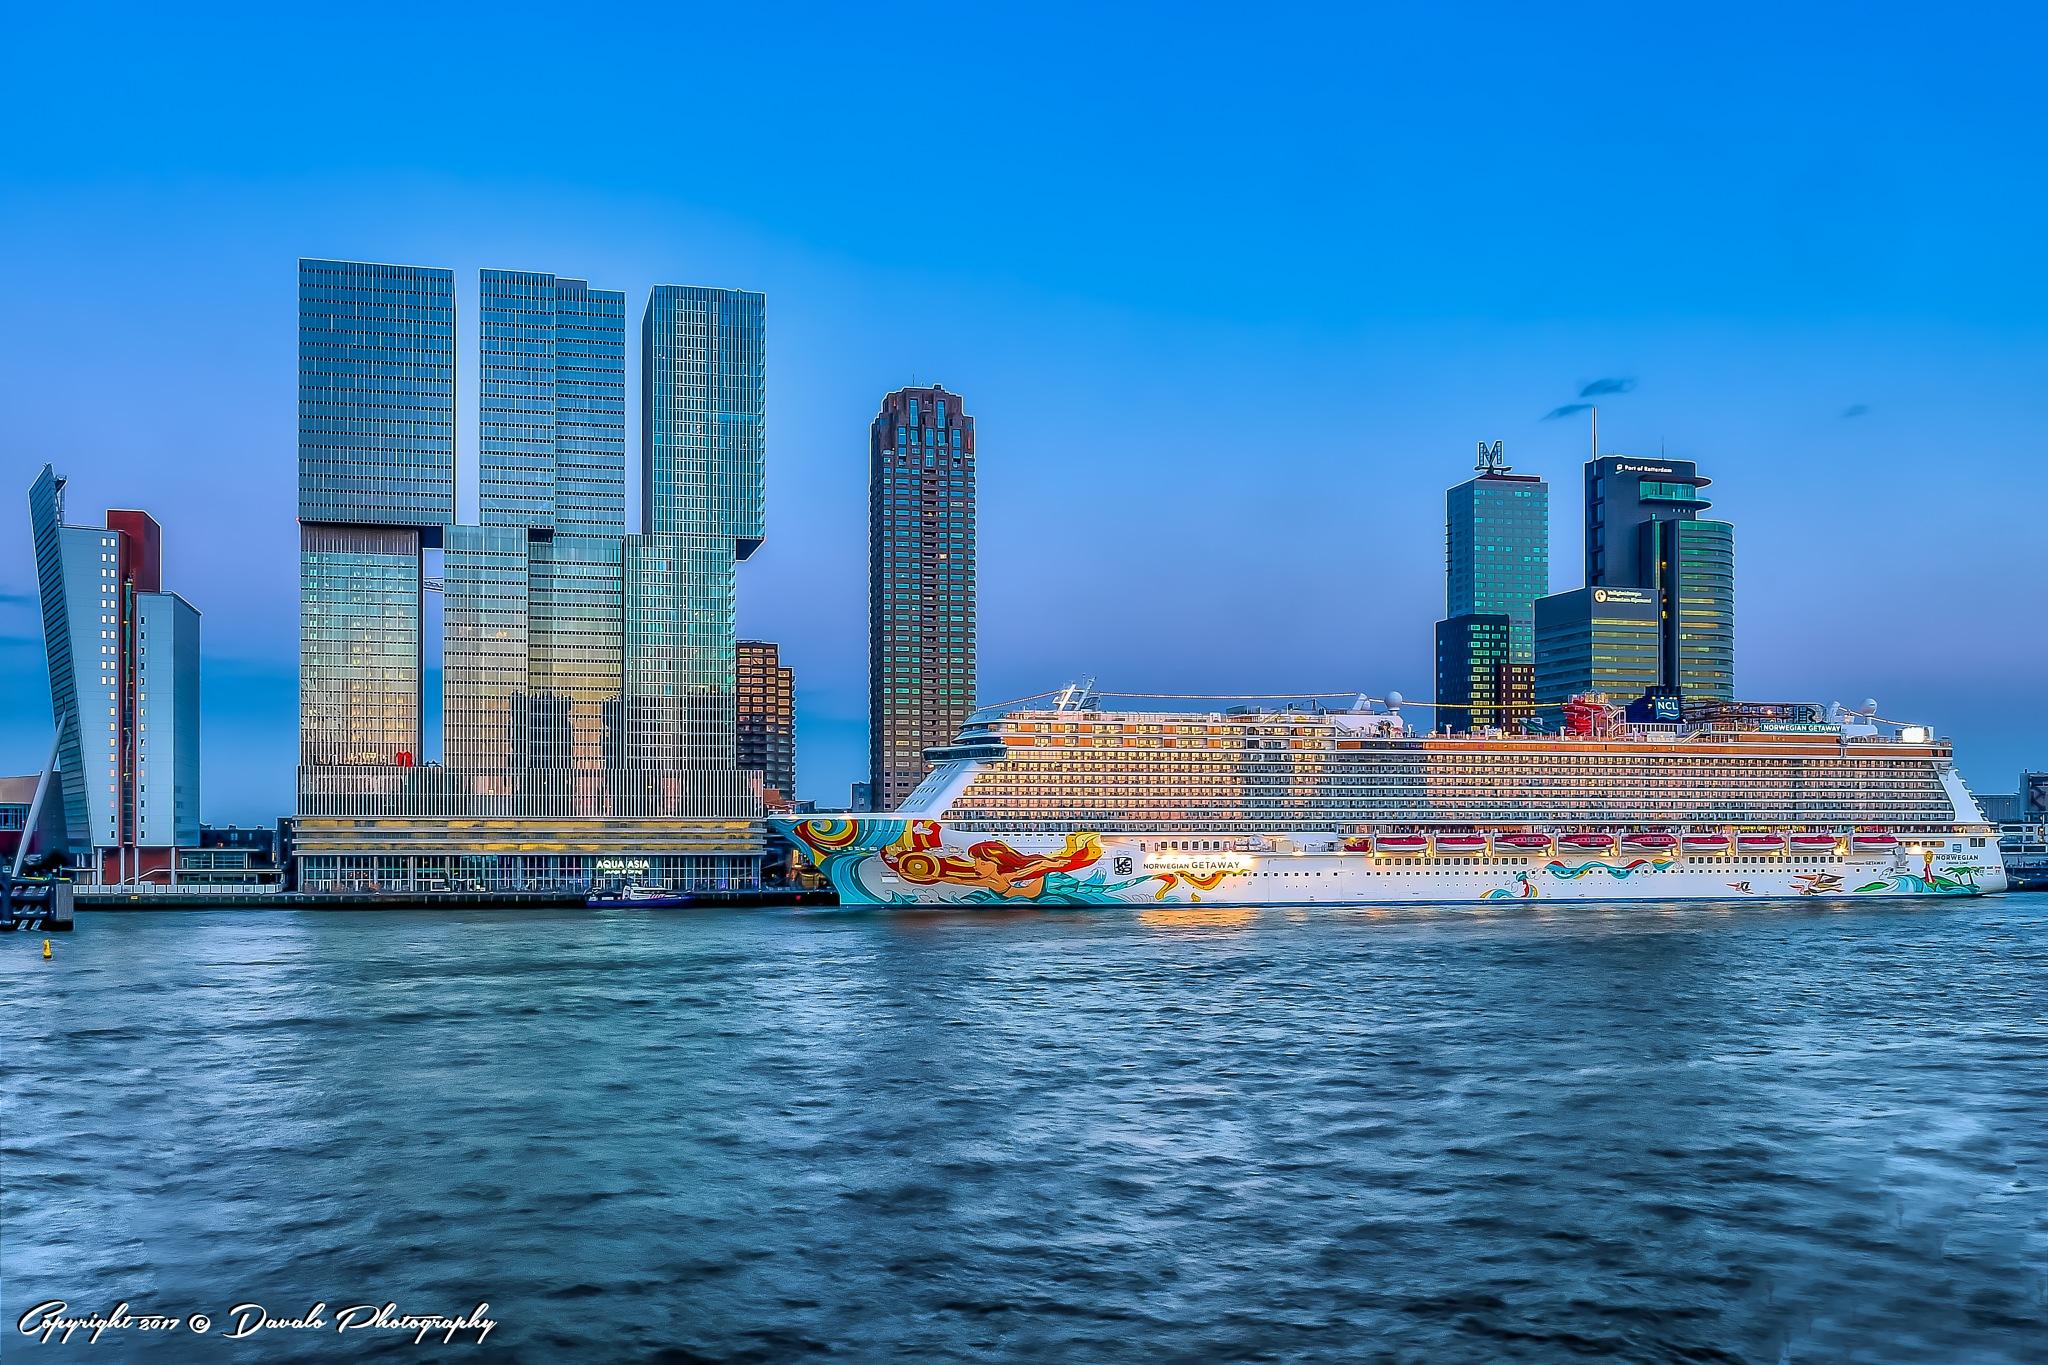 Rotterdam City by Davalo Photography